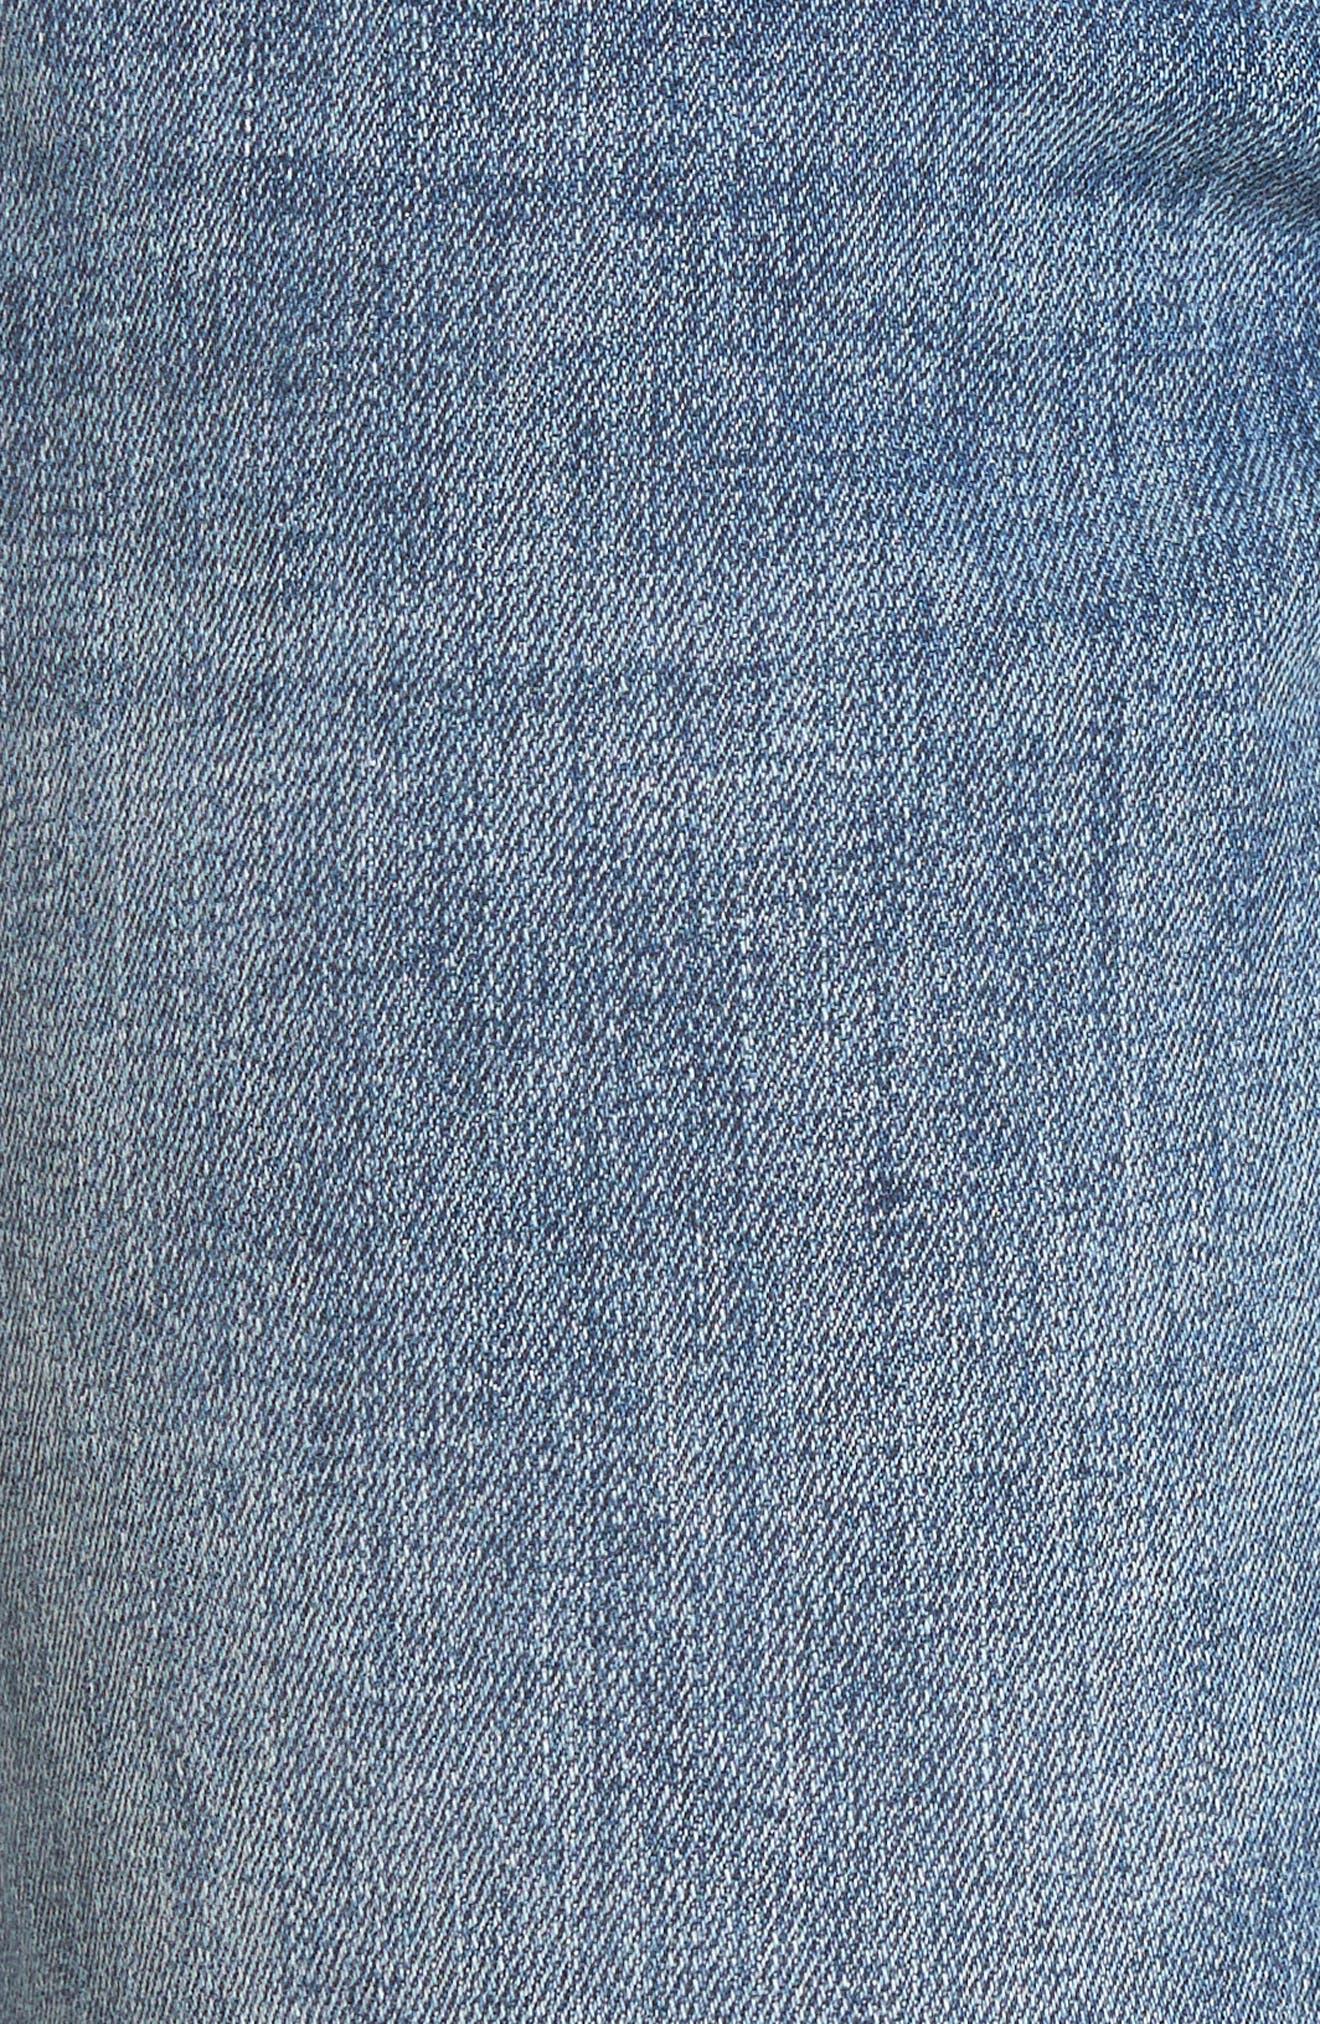 Davis Ankle Girlfriend Jeans,                             Alternate thumbnail 6, color,                             Alamo